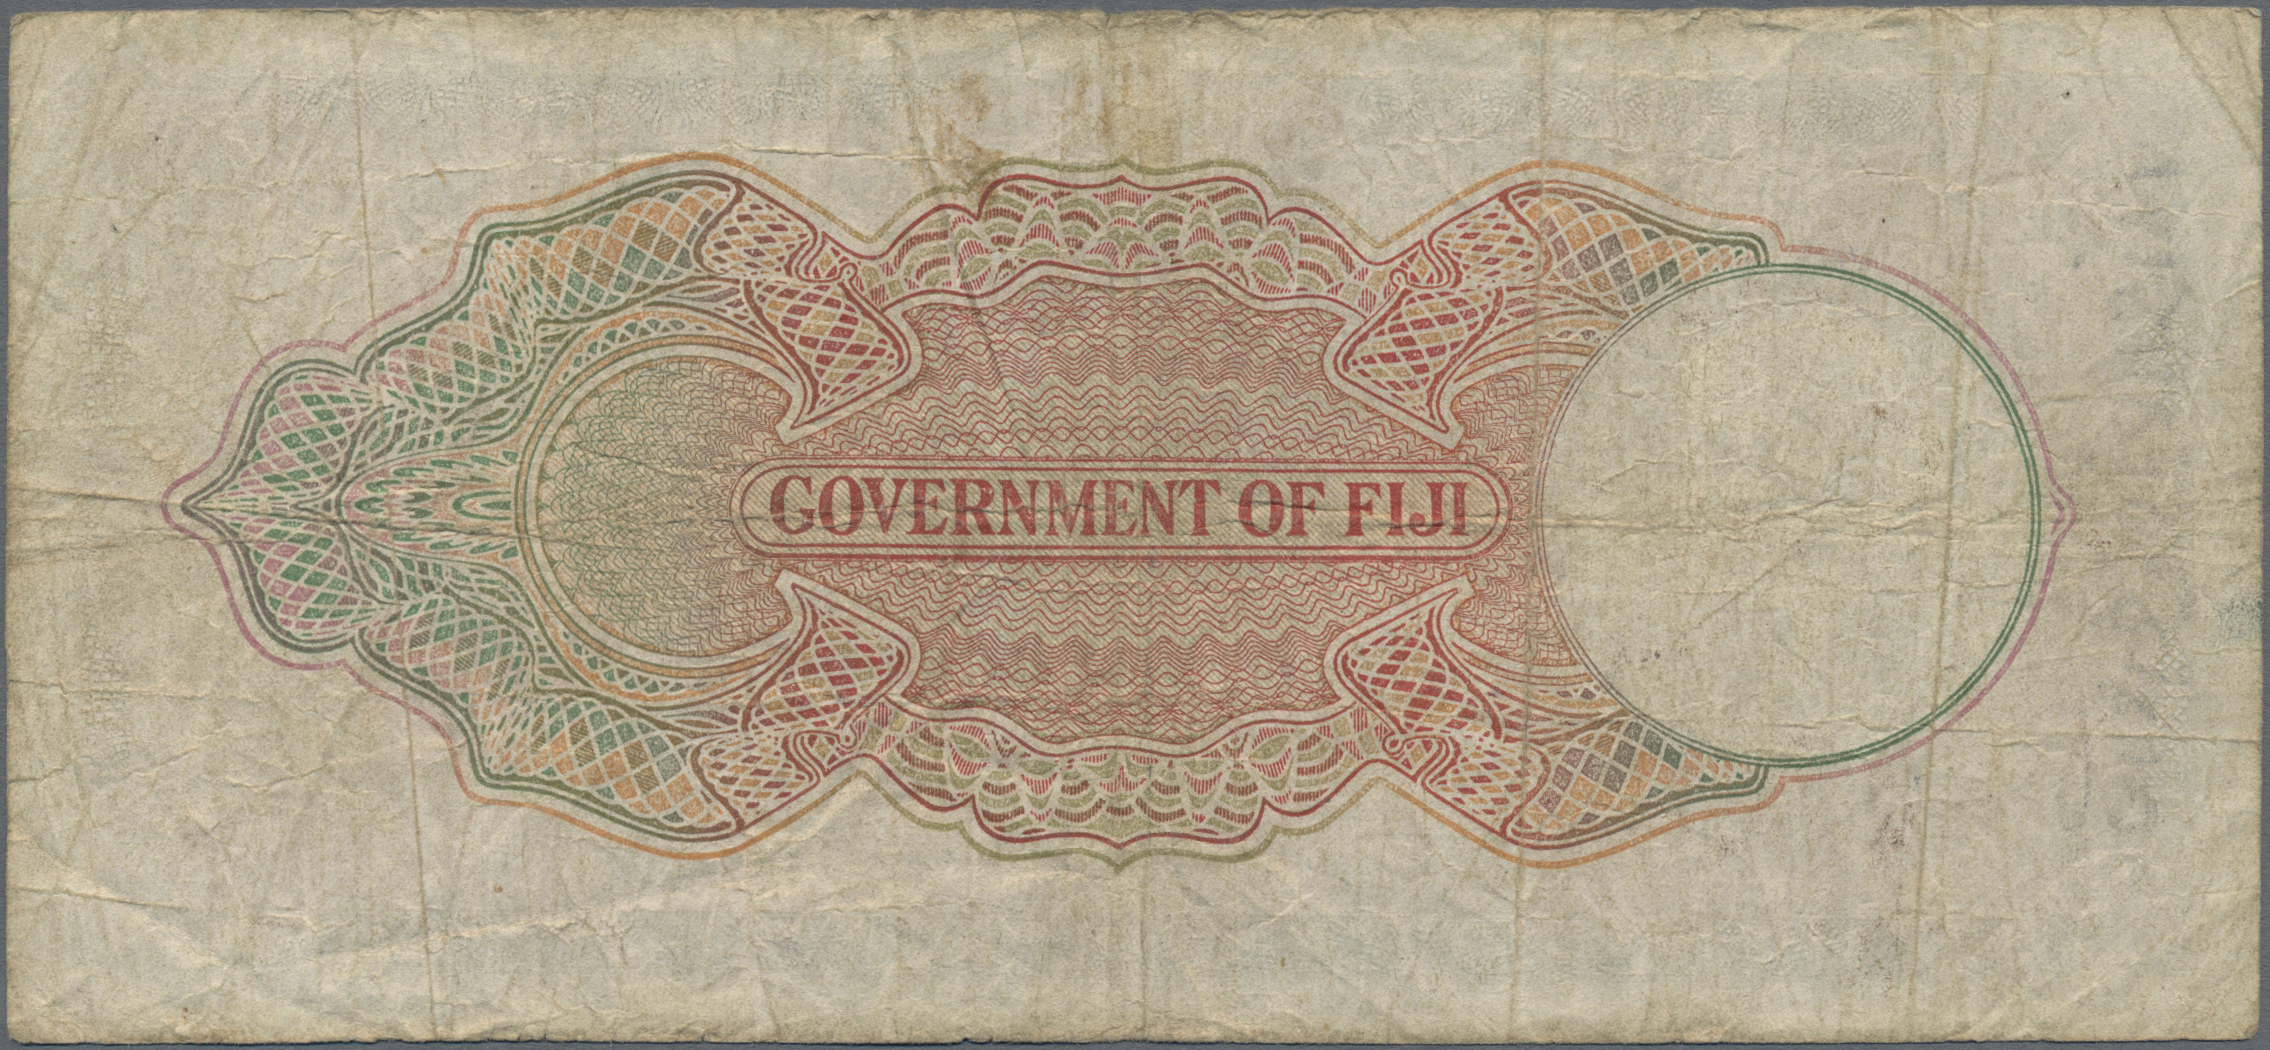 Lot 00242 - Fiji | Banknoten  -  Auktionshaus Christoph Gärtner GmbH & Co. KG Sale #48 The Banknotes